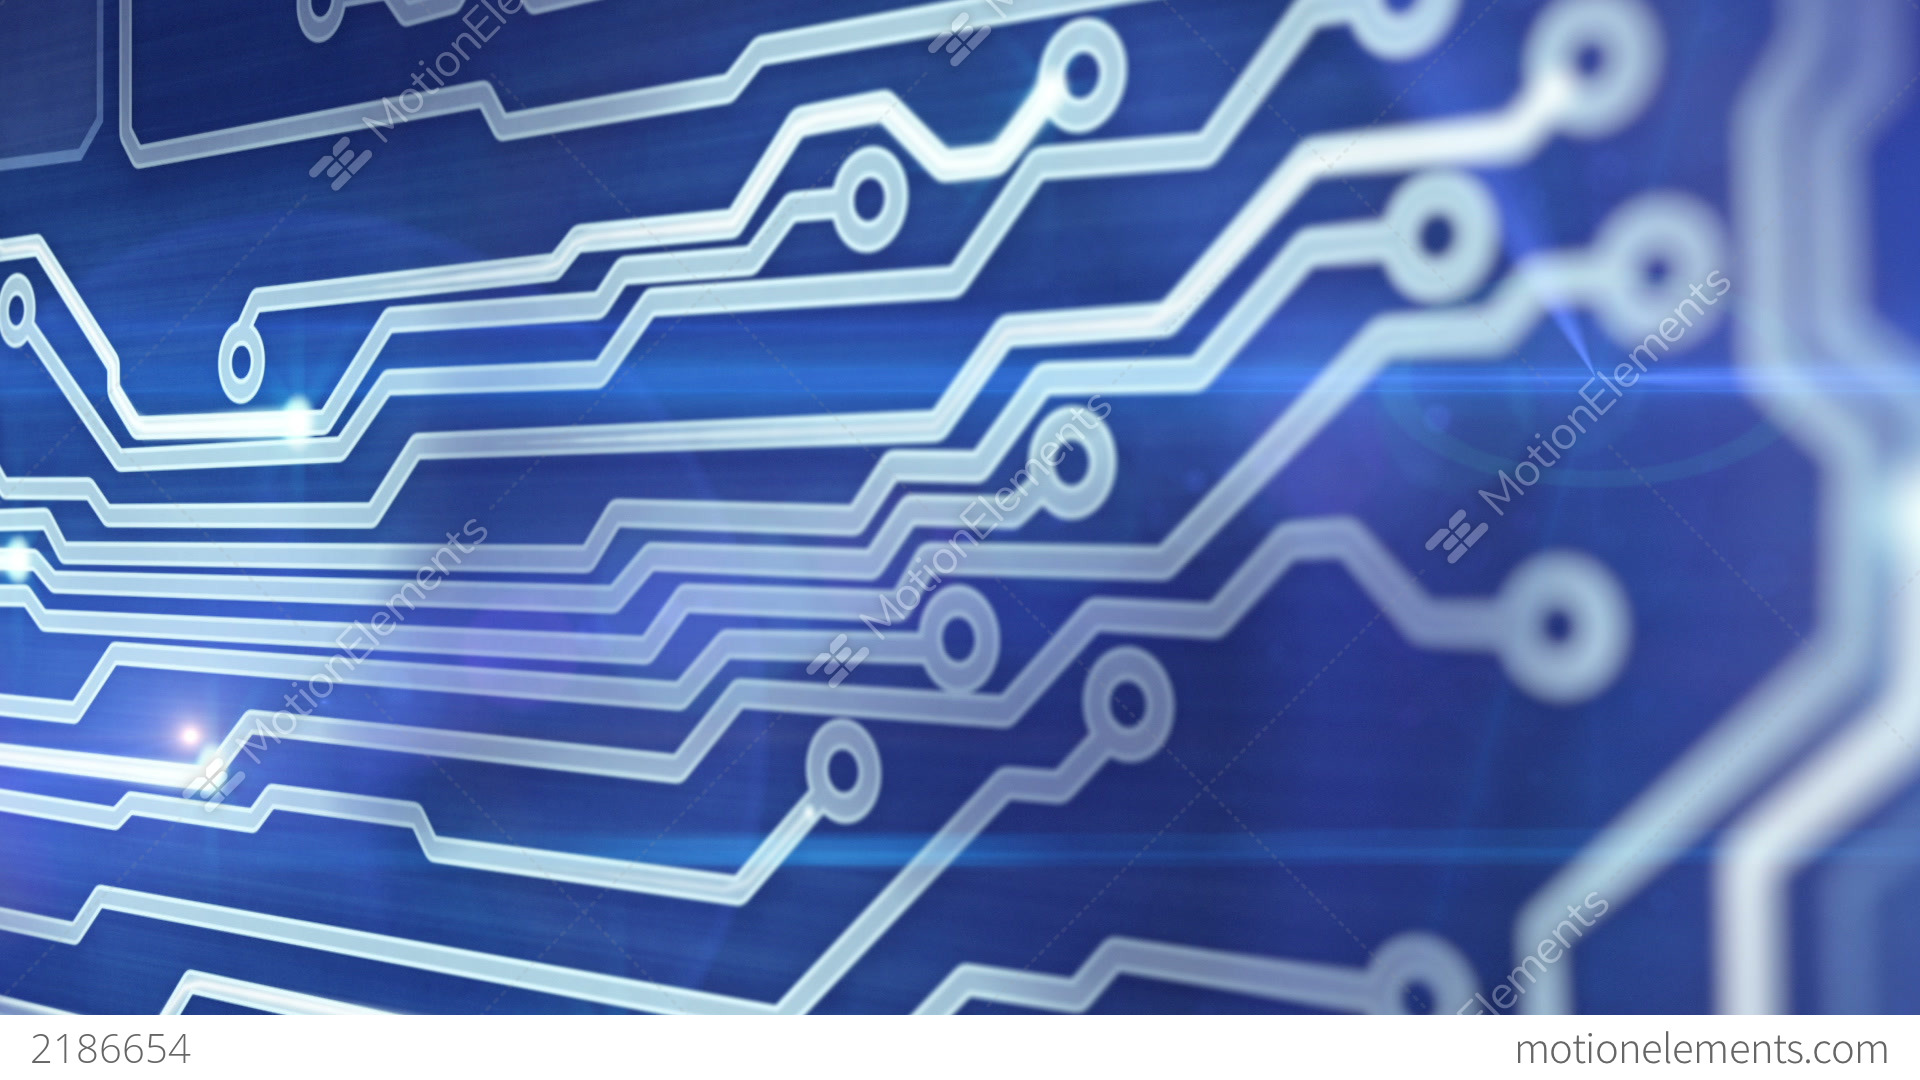 Blue Circuit Board Images Stock Photos Vectors Wallpaper Pattern Bluecircuit Providing Signals 3d Animation Video Footage